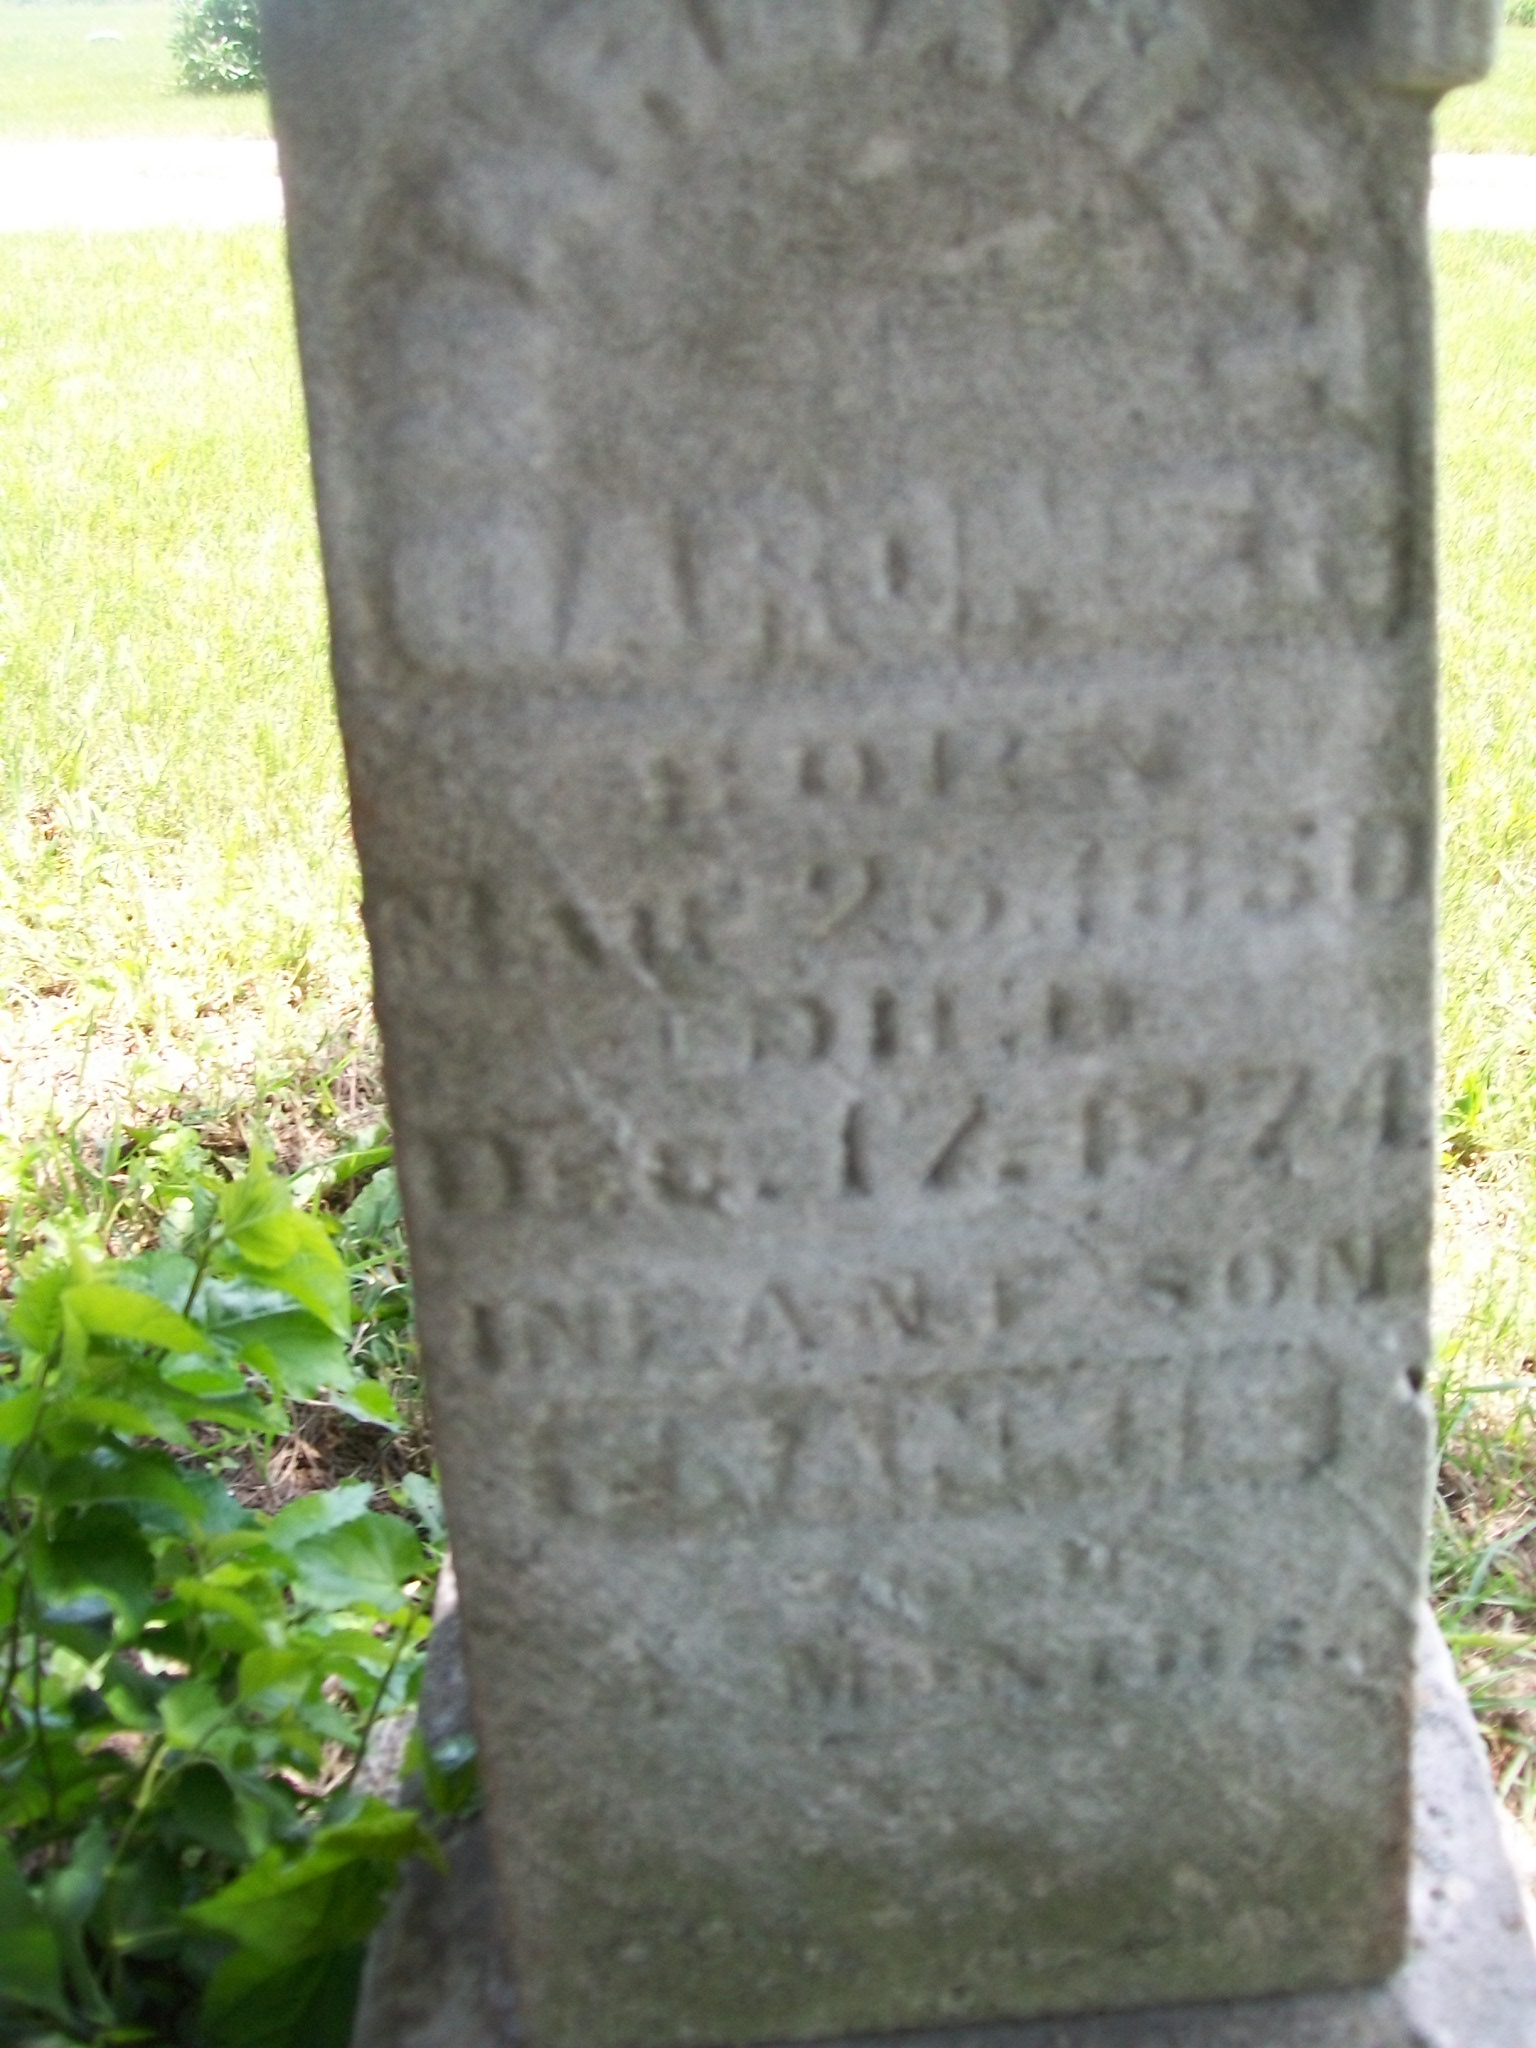 Margaret Gardner